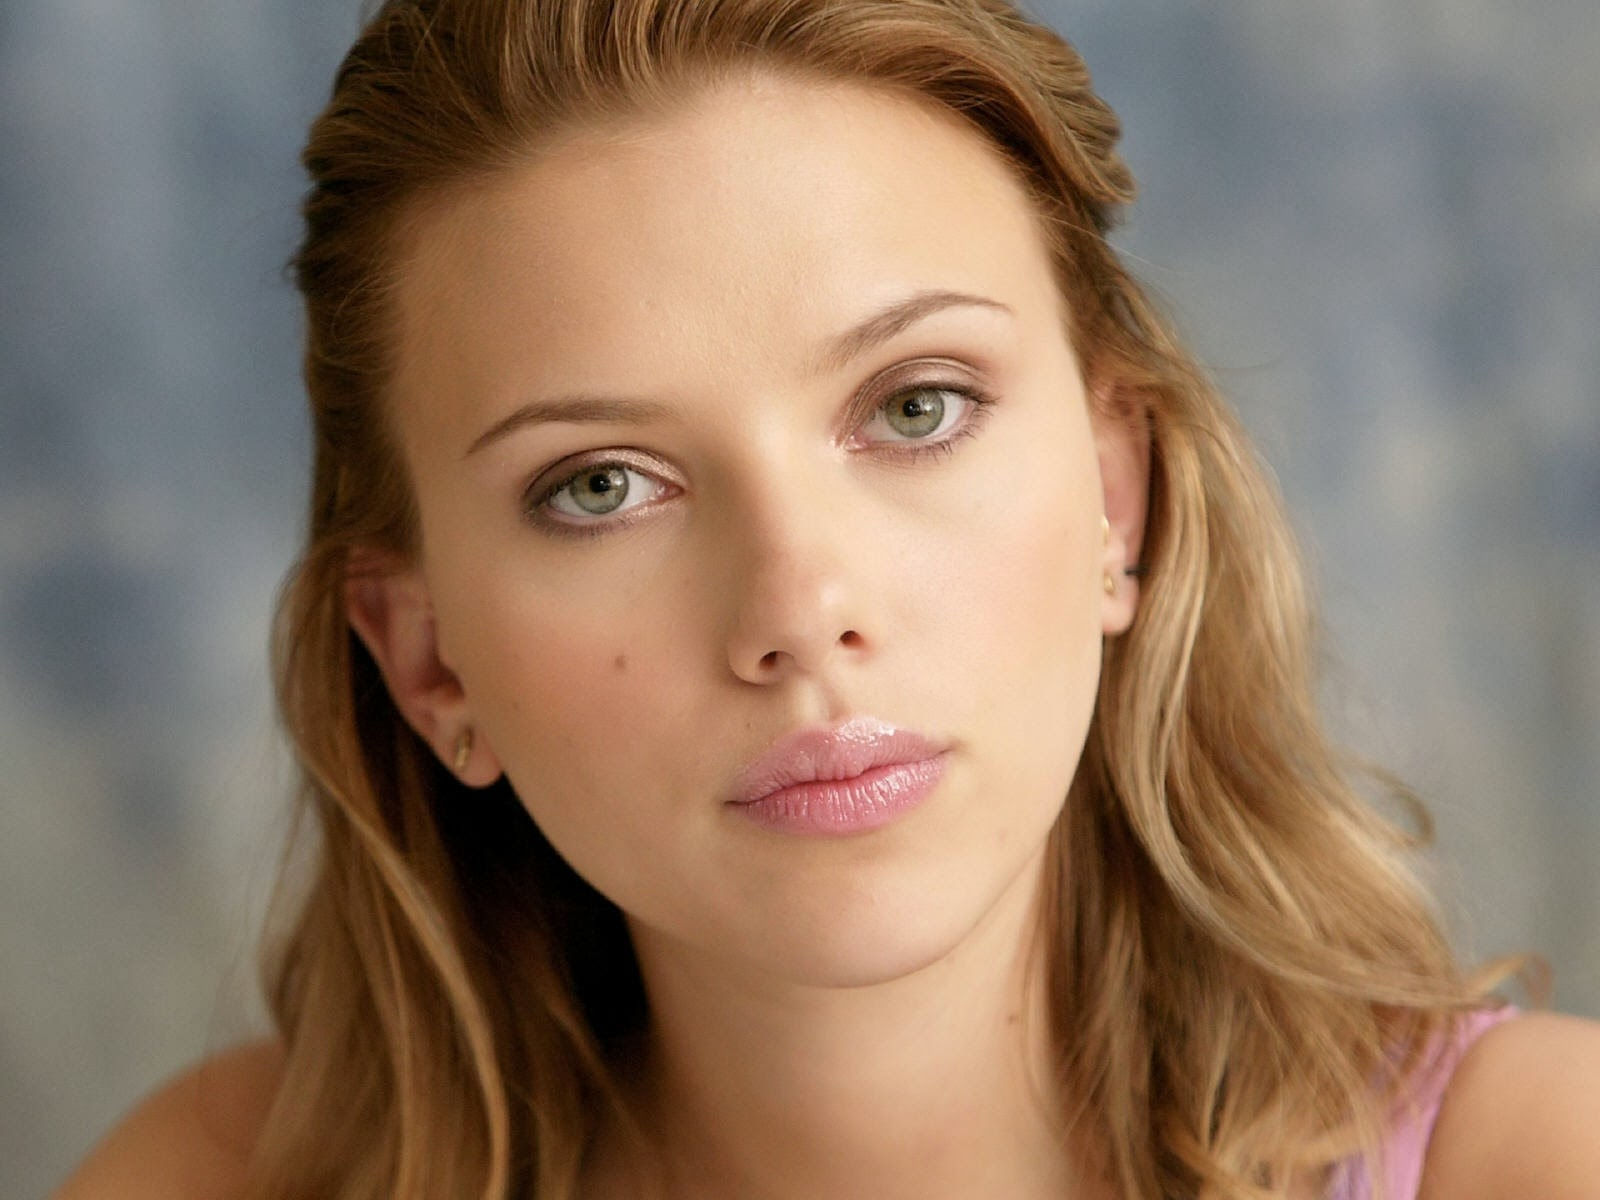 STARS WALLPAPER: Scarlett Johansson HD Wallpapers Free Download